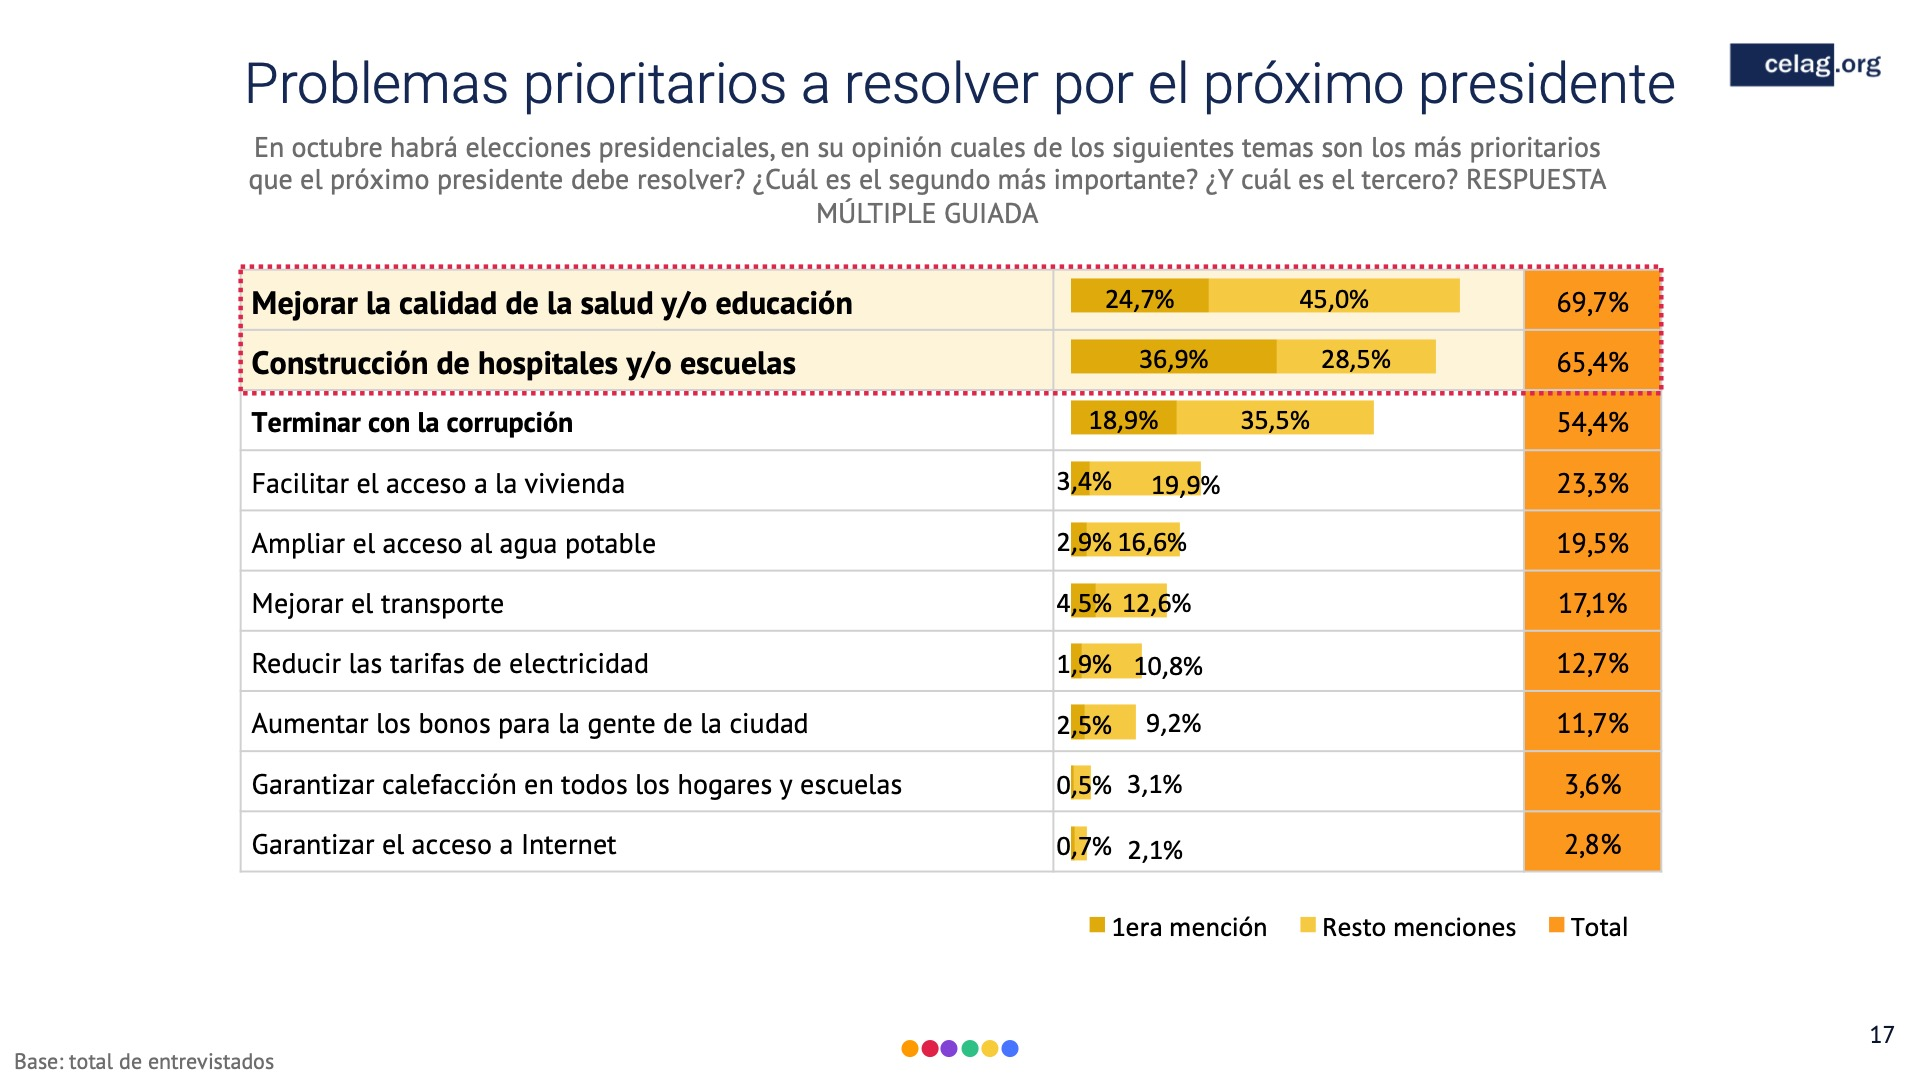 17 Elecciones bolivia Porblemas a resolver presidente